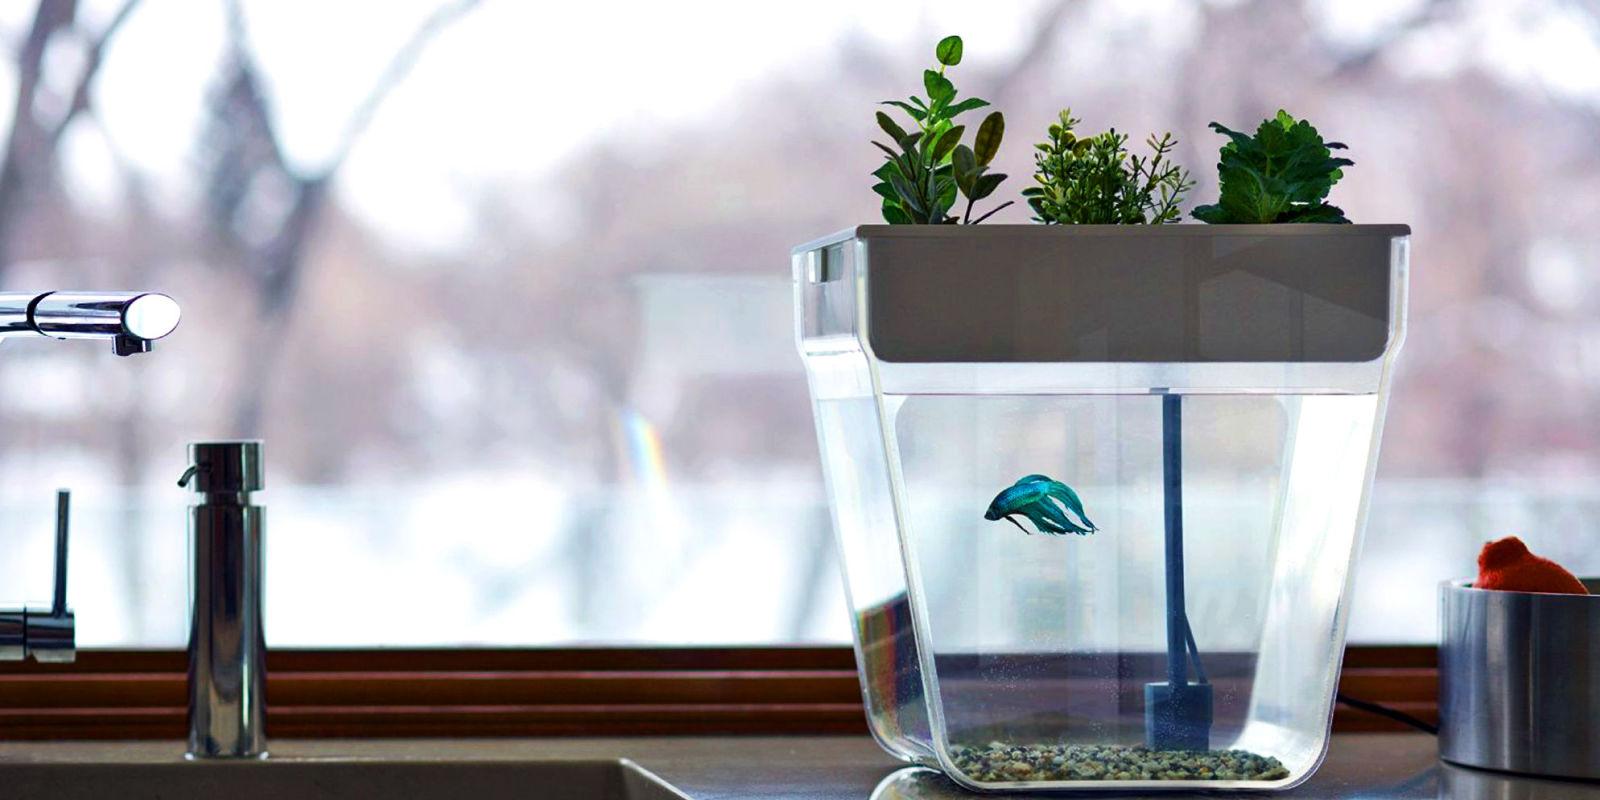 5 Best Aquatic Ecosystems Of 2017   Freshwater Aquatic Ecosystems And  Terrariums